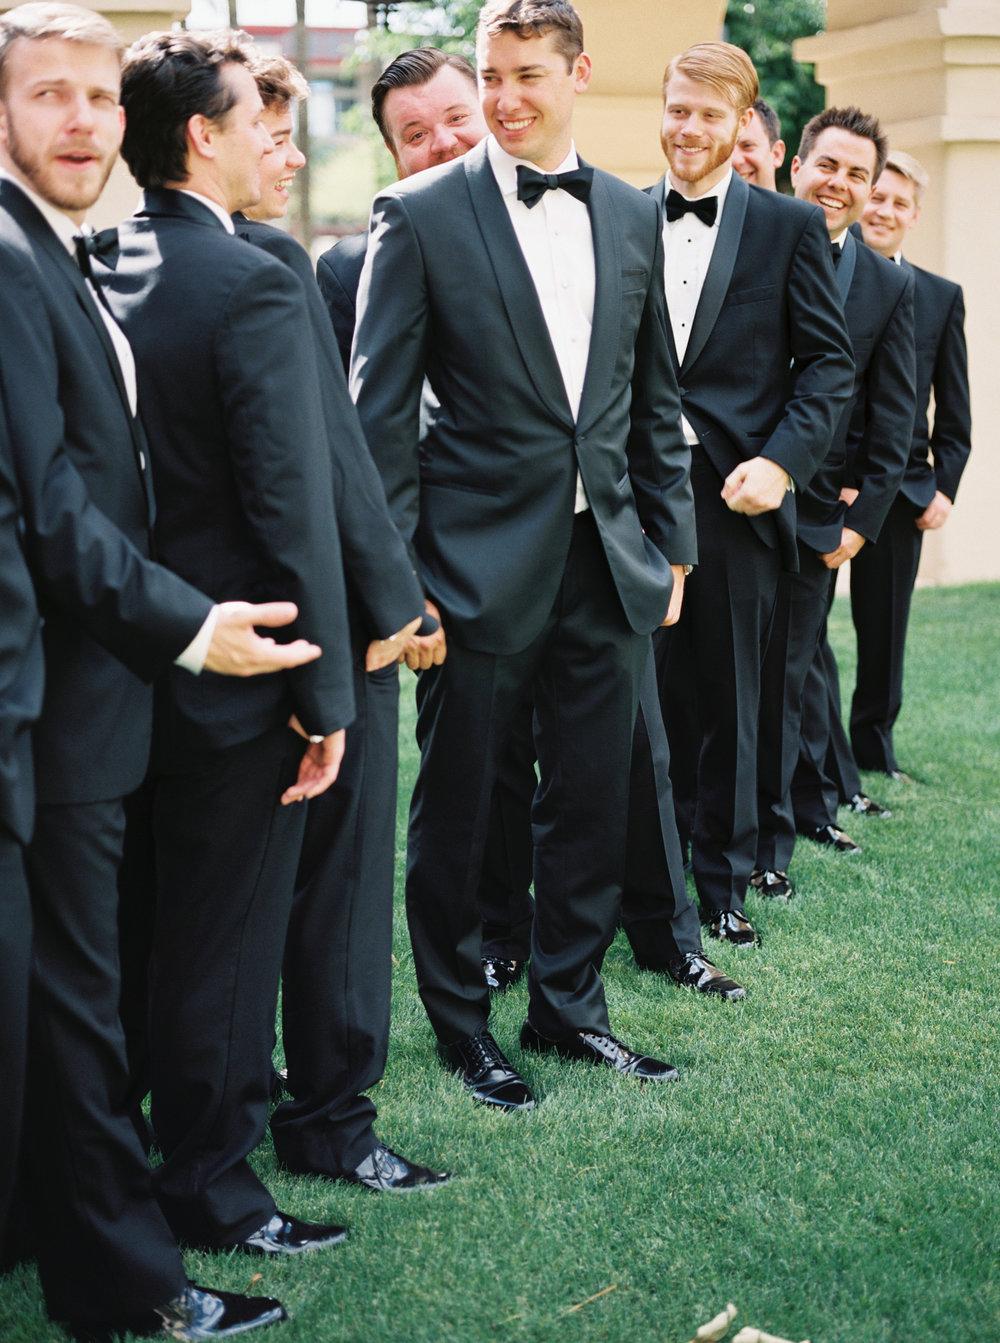 Scottsdale-wedding-planner-0026.jpg